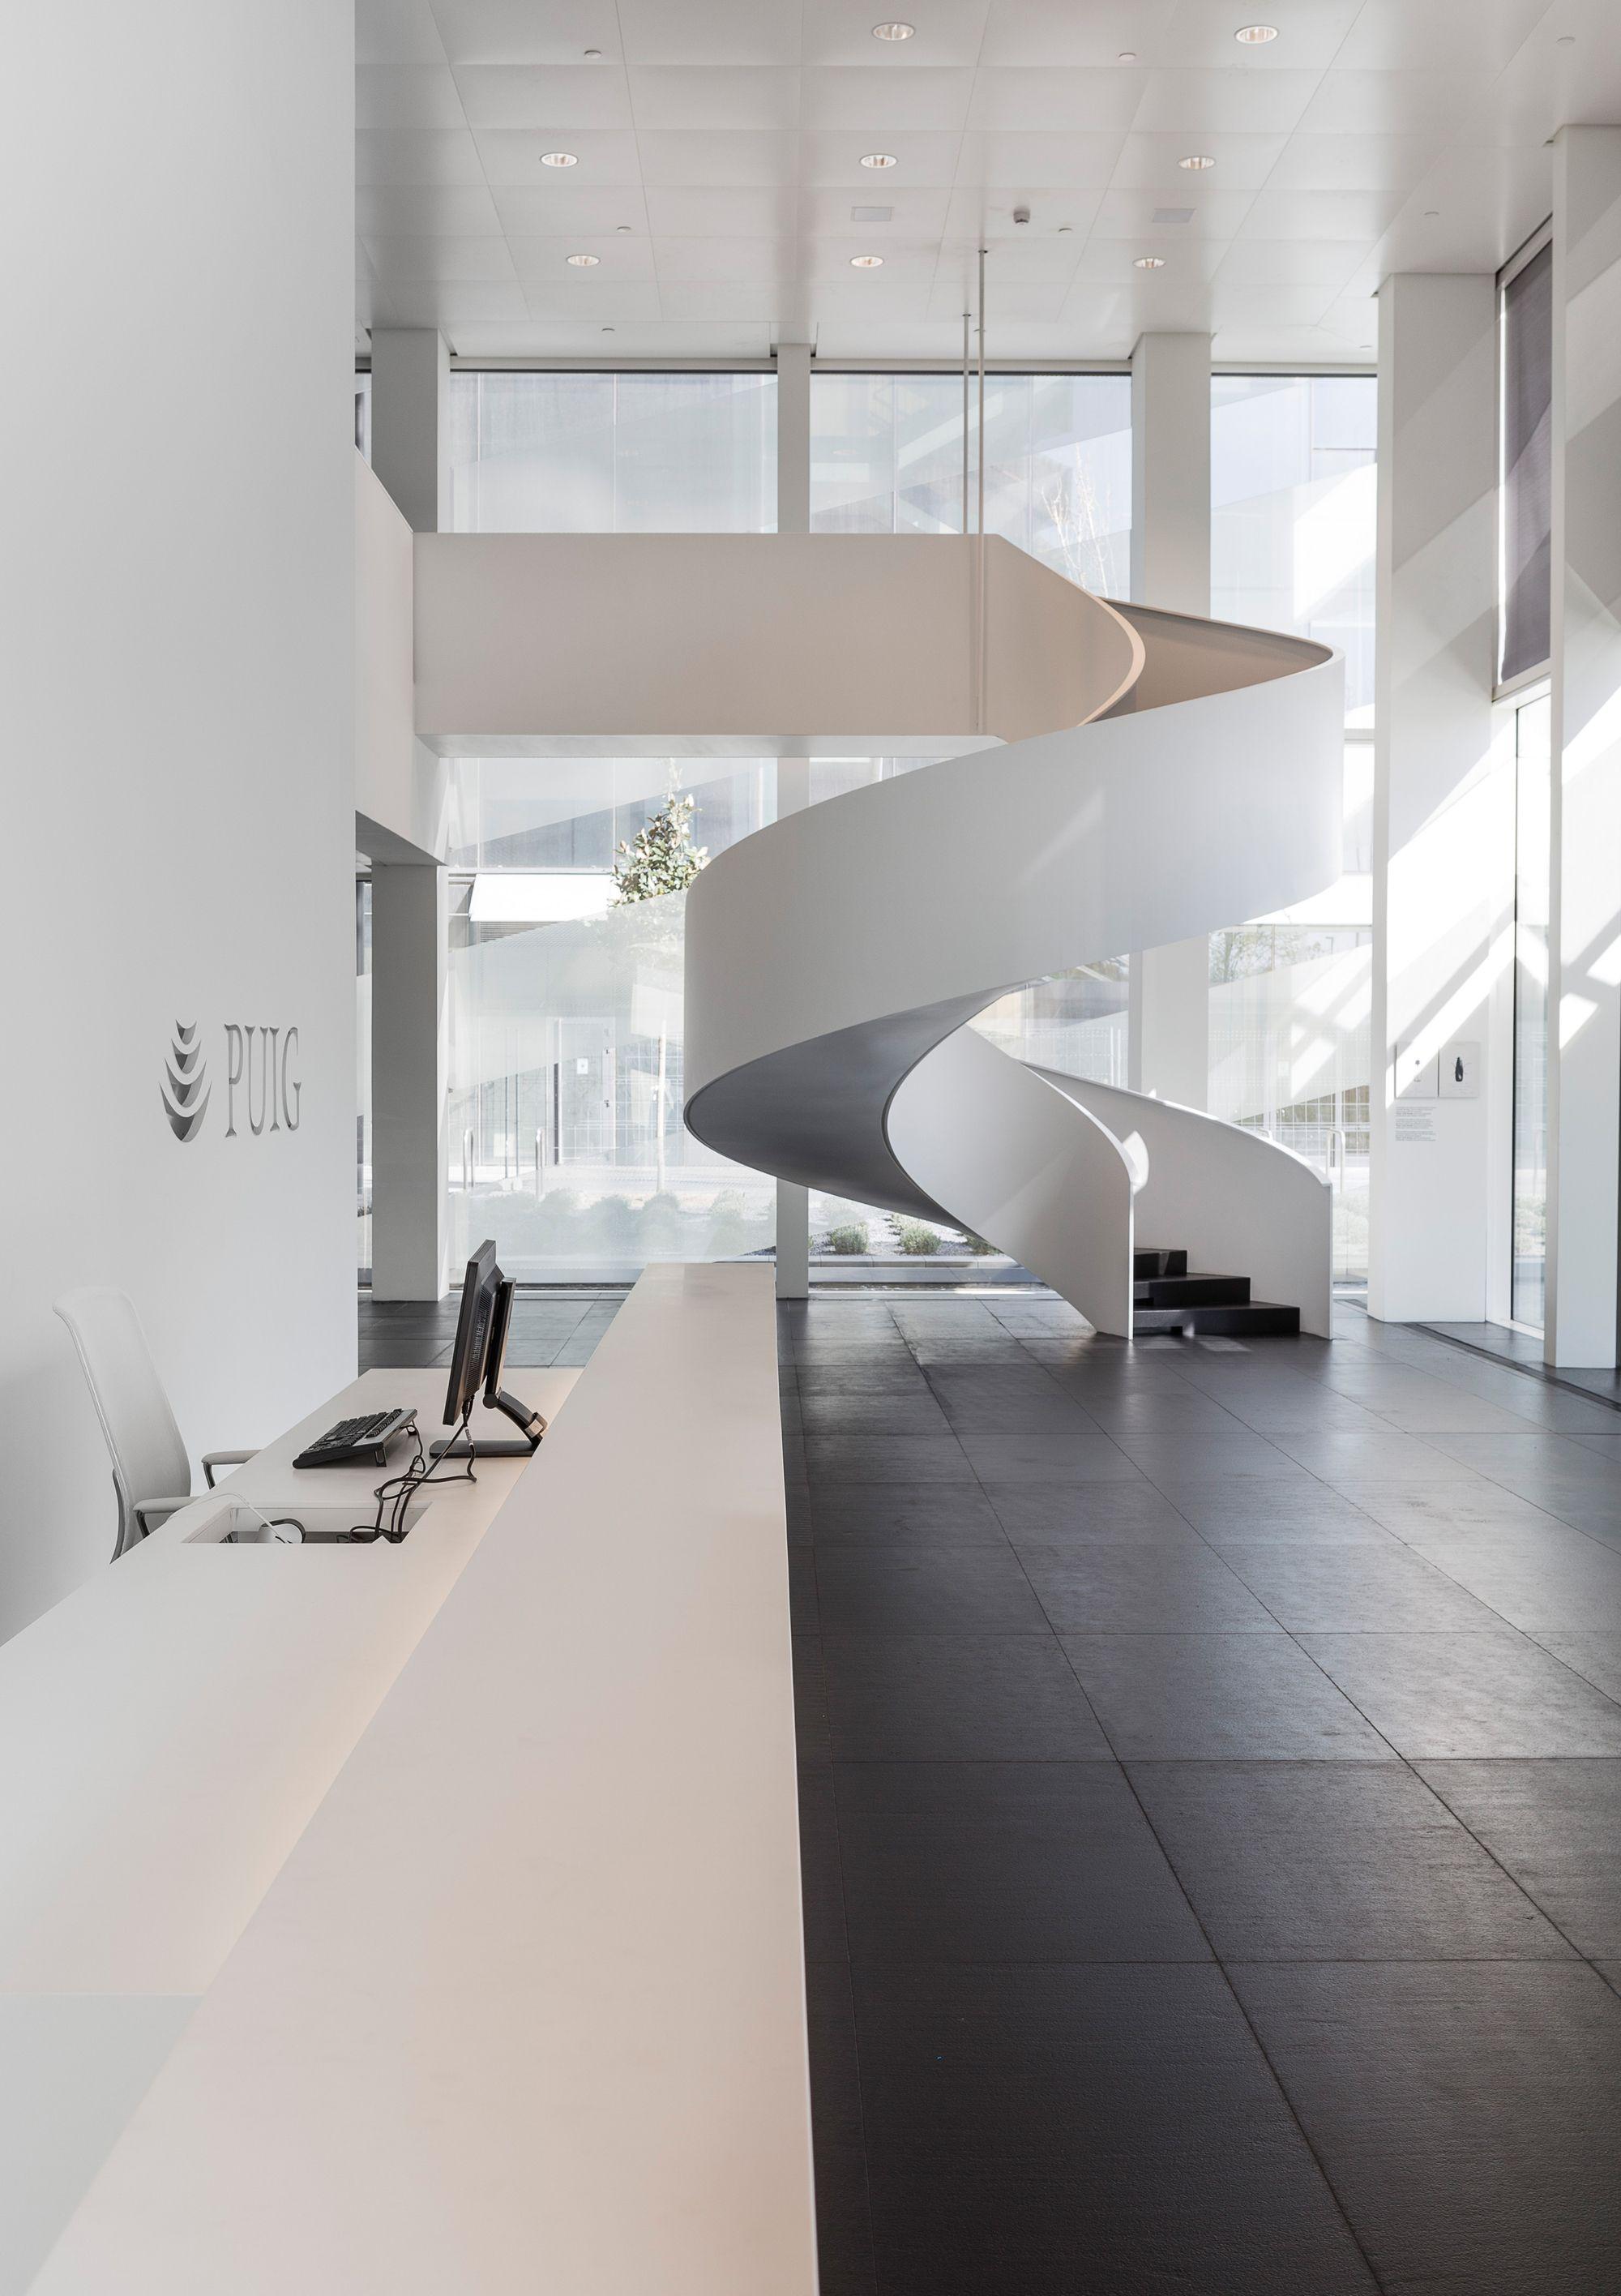 Gallery of puig tower rafael moneo antonio puig josep for Innenraumdesign studium